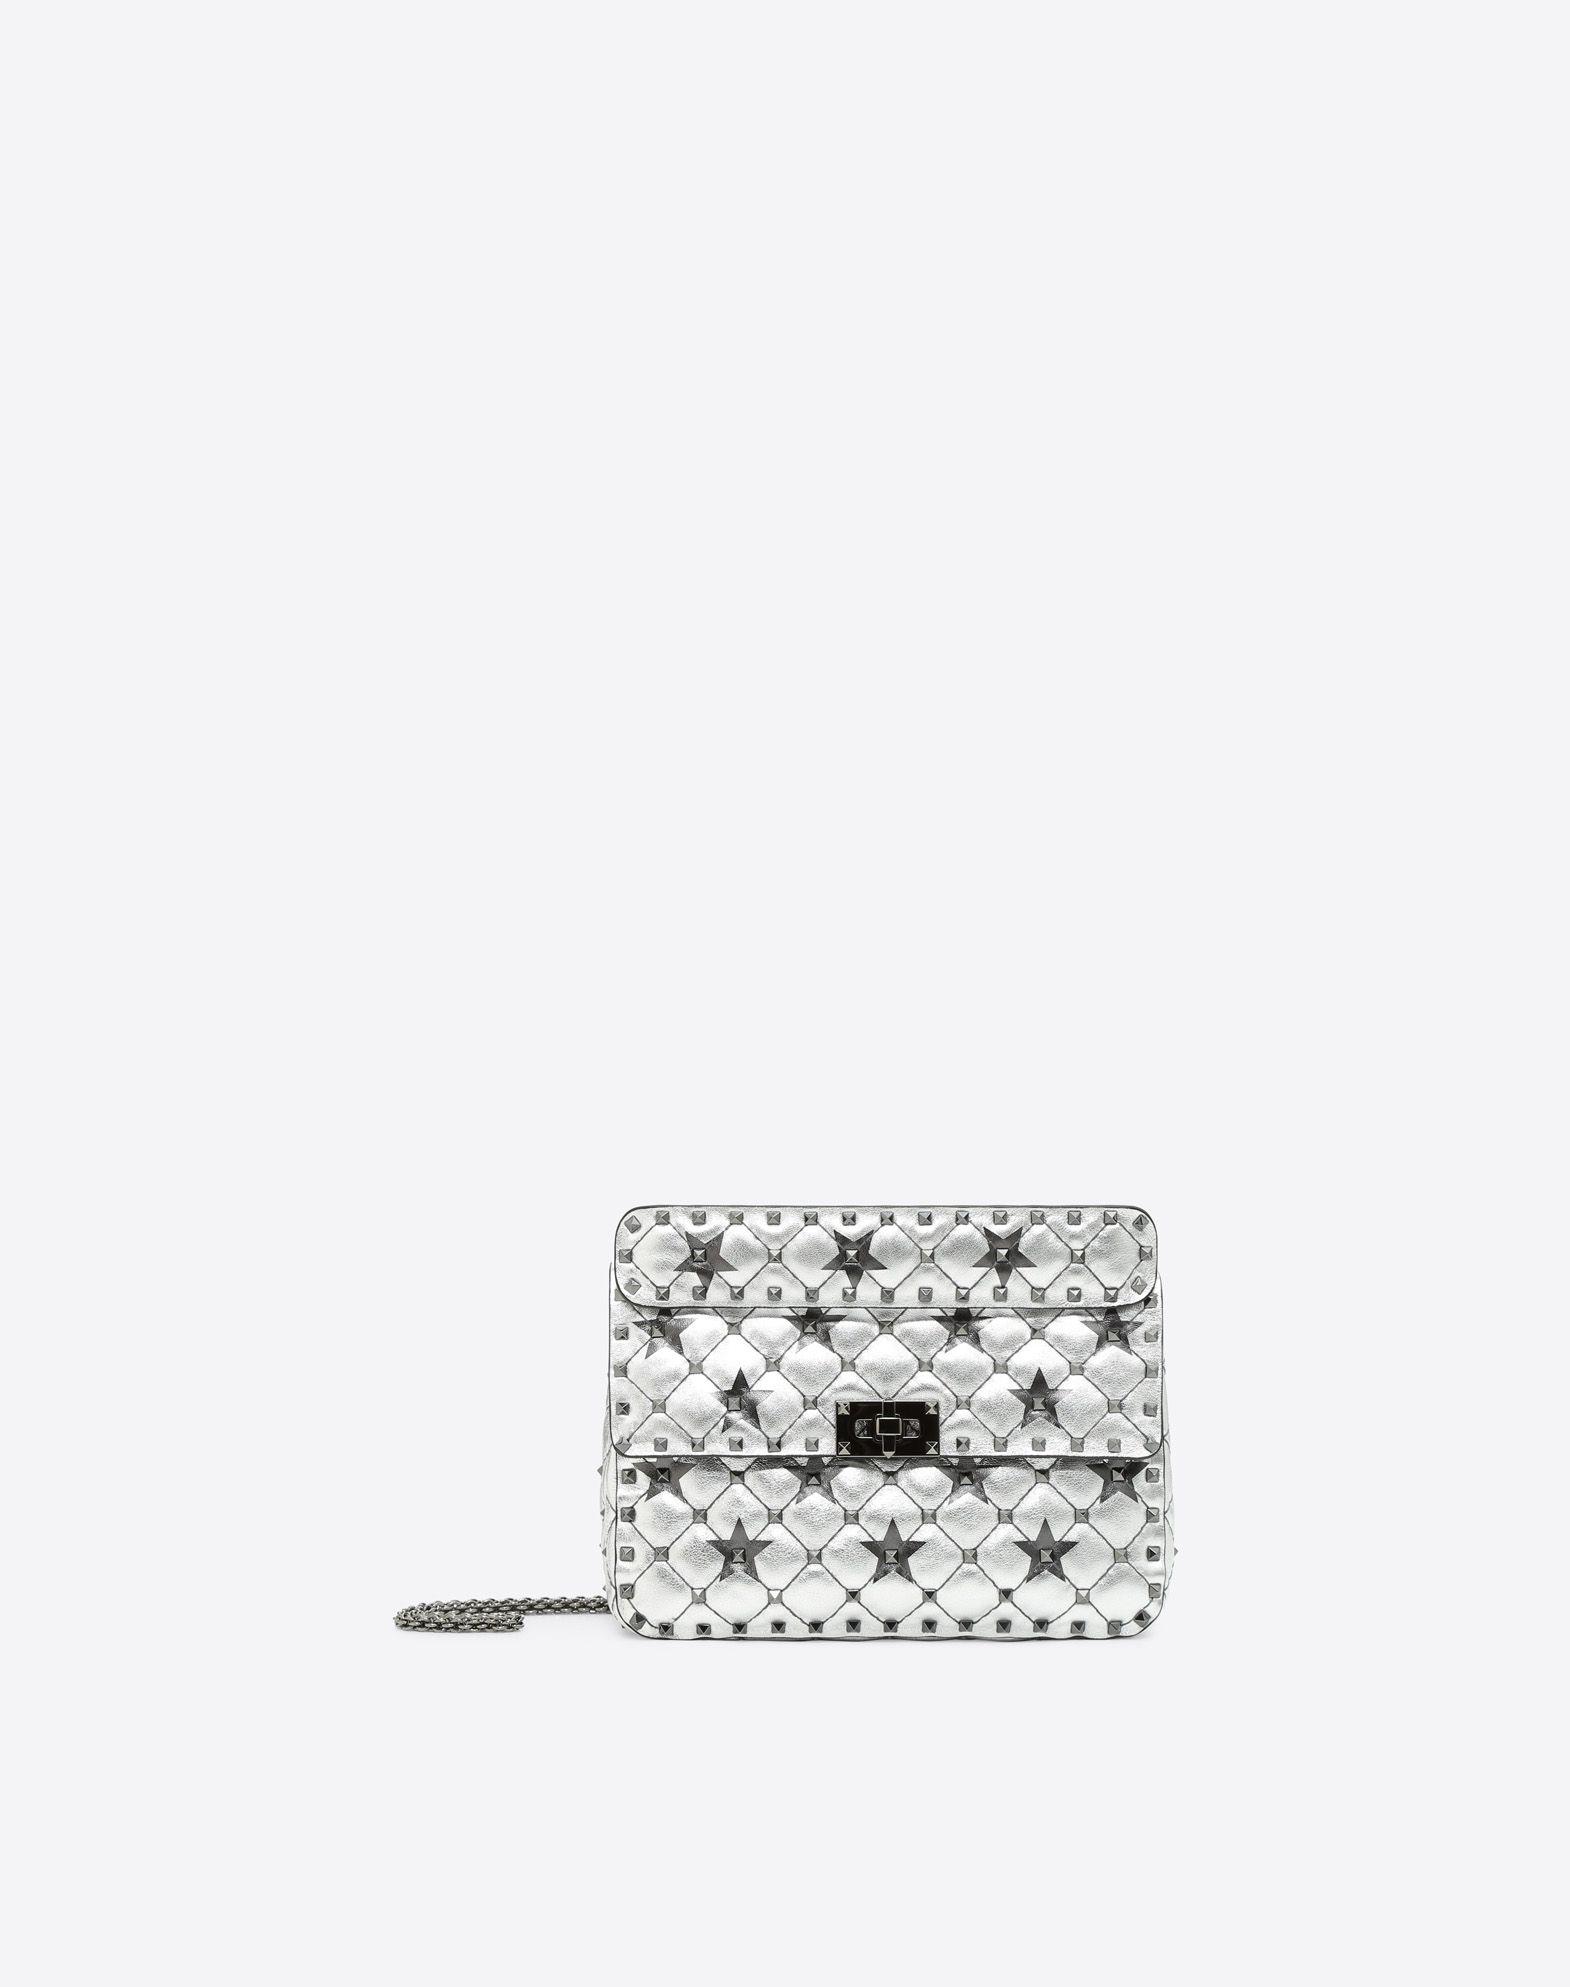 VALENTINO GARAVANI Rockstud Spike.It Medium Chain Bag Shoulder bag D f